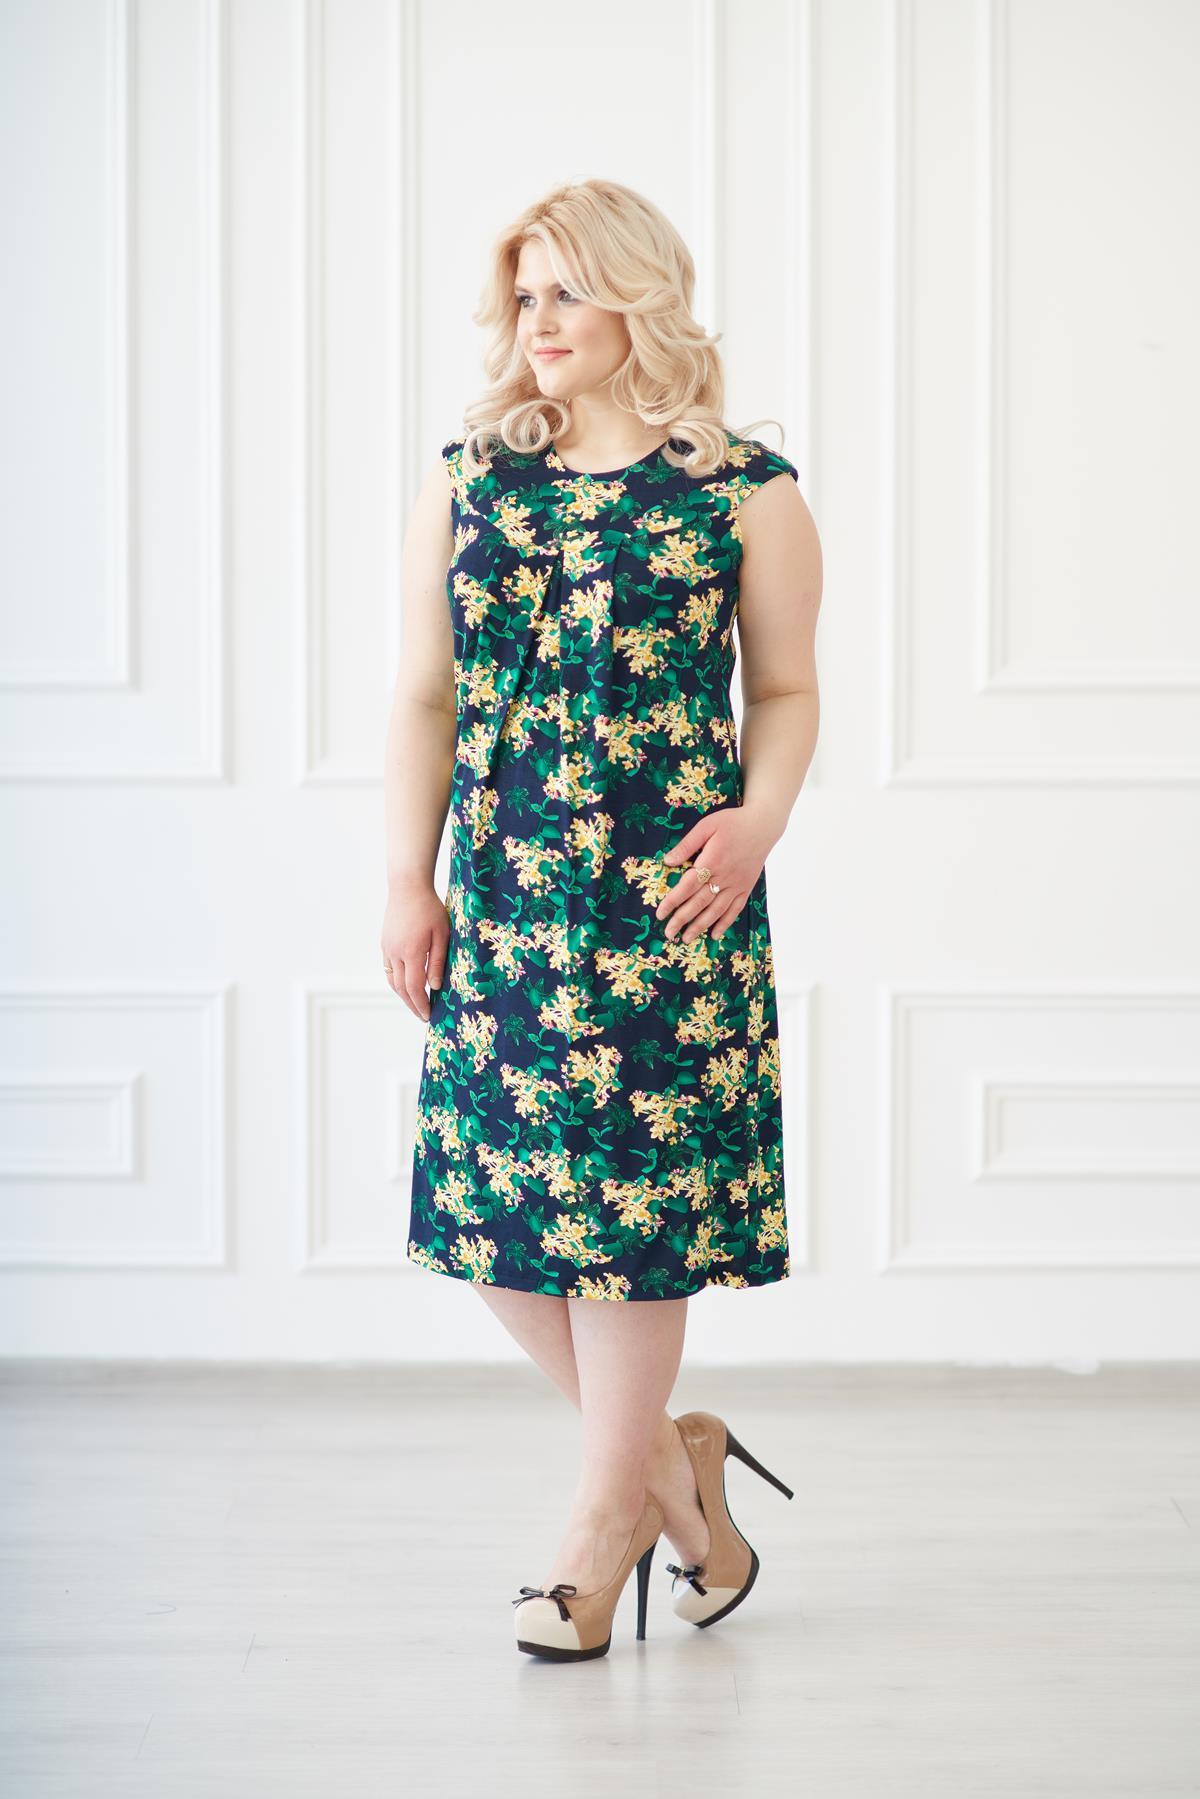 Жен. платье арт. 19-0138 Желто-изумрудный р. 48Платья<br>Факт. ОГ: 92 см <br>Факт. ОТ: 92 см <br>Факт. ОБ: 106 см <br>Длина по спинке: 98 см<br><br>Тип: Жен. платье<br>Размер: 48<br>Материал: Вискоза